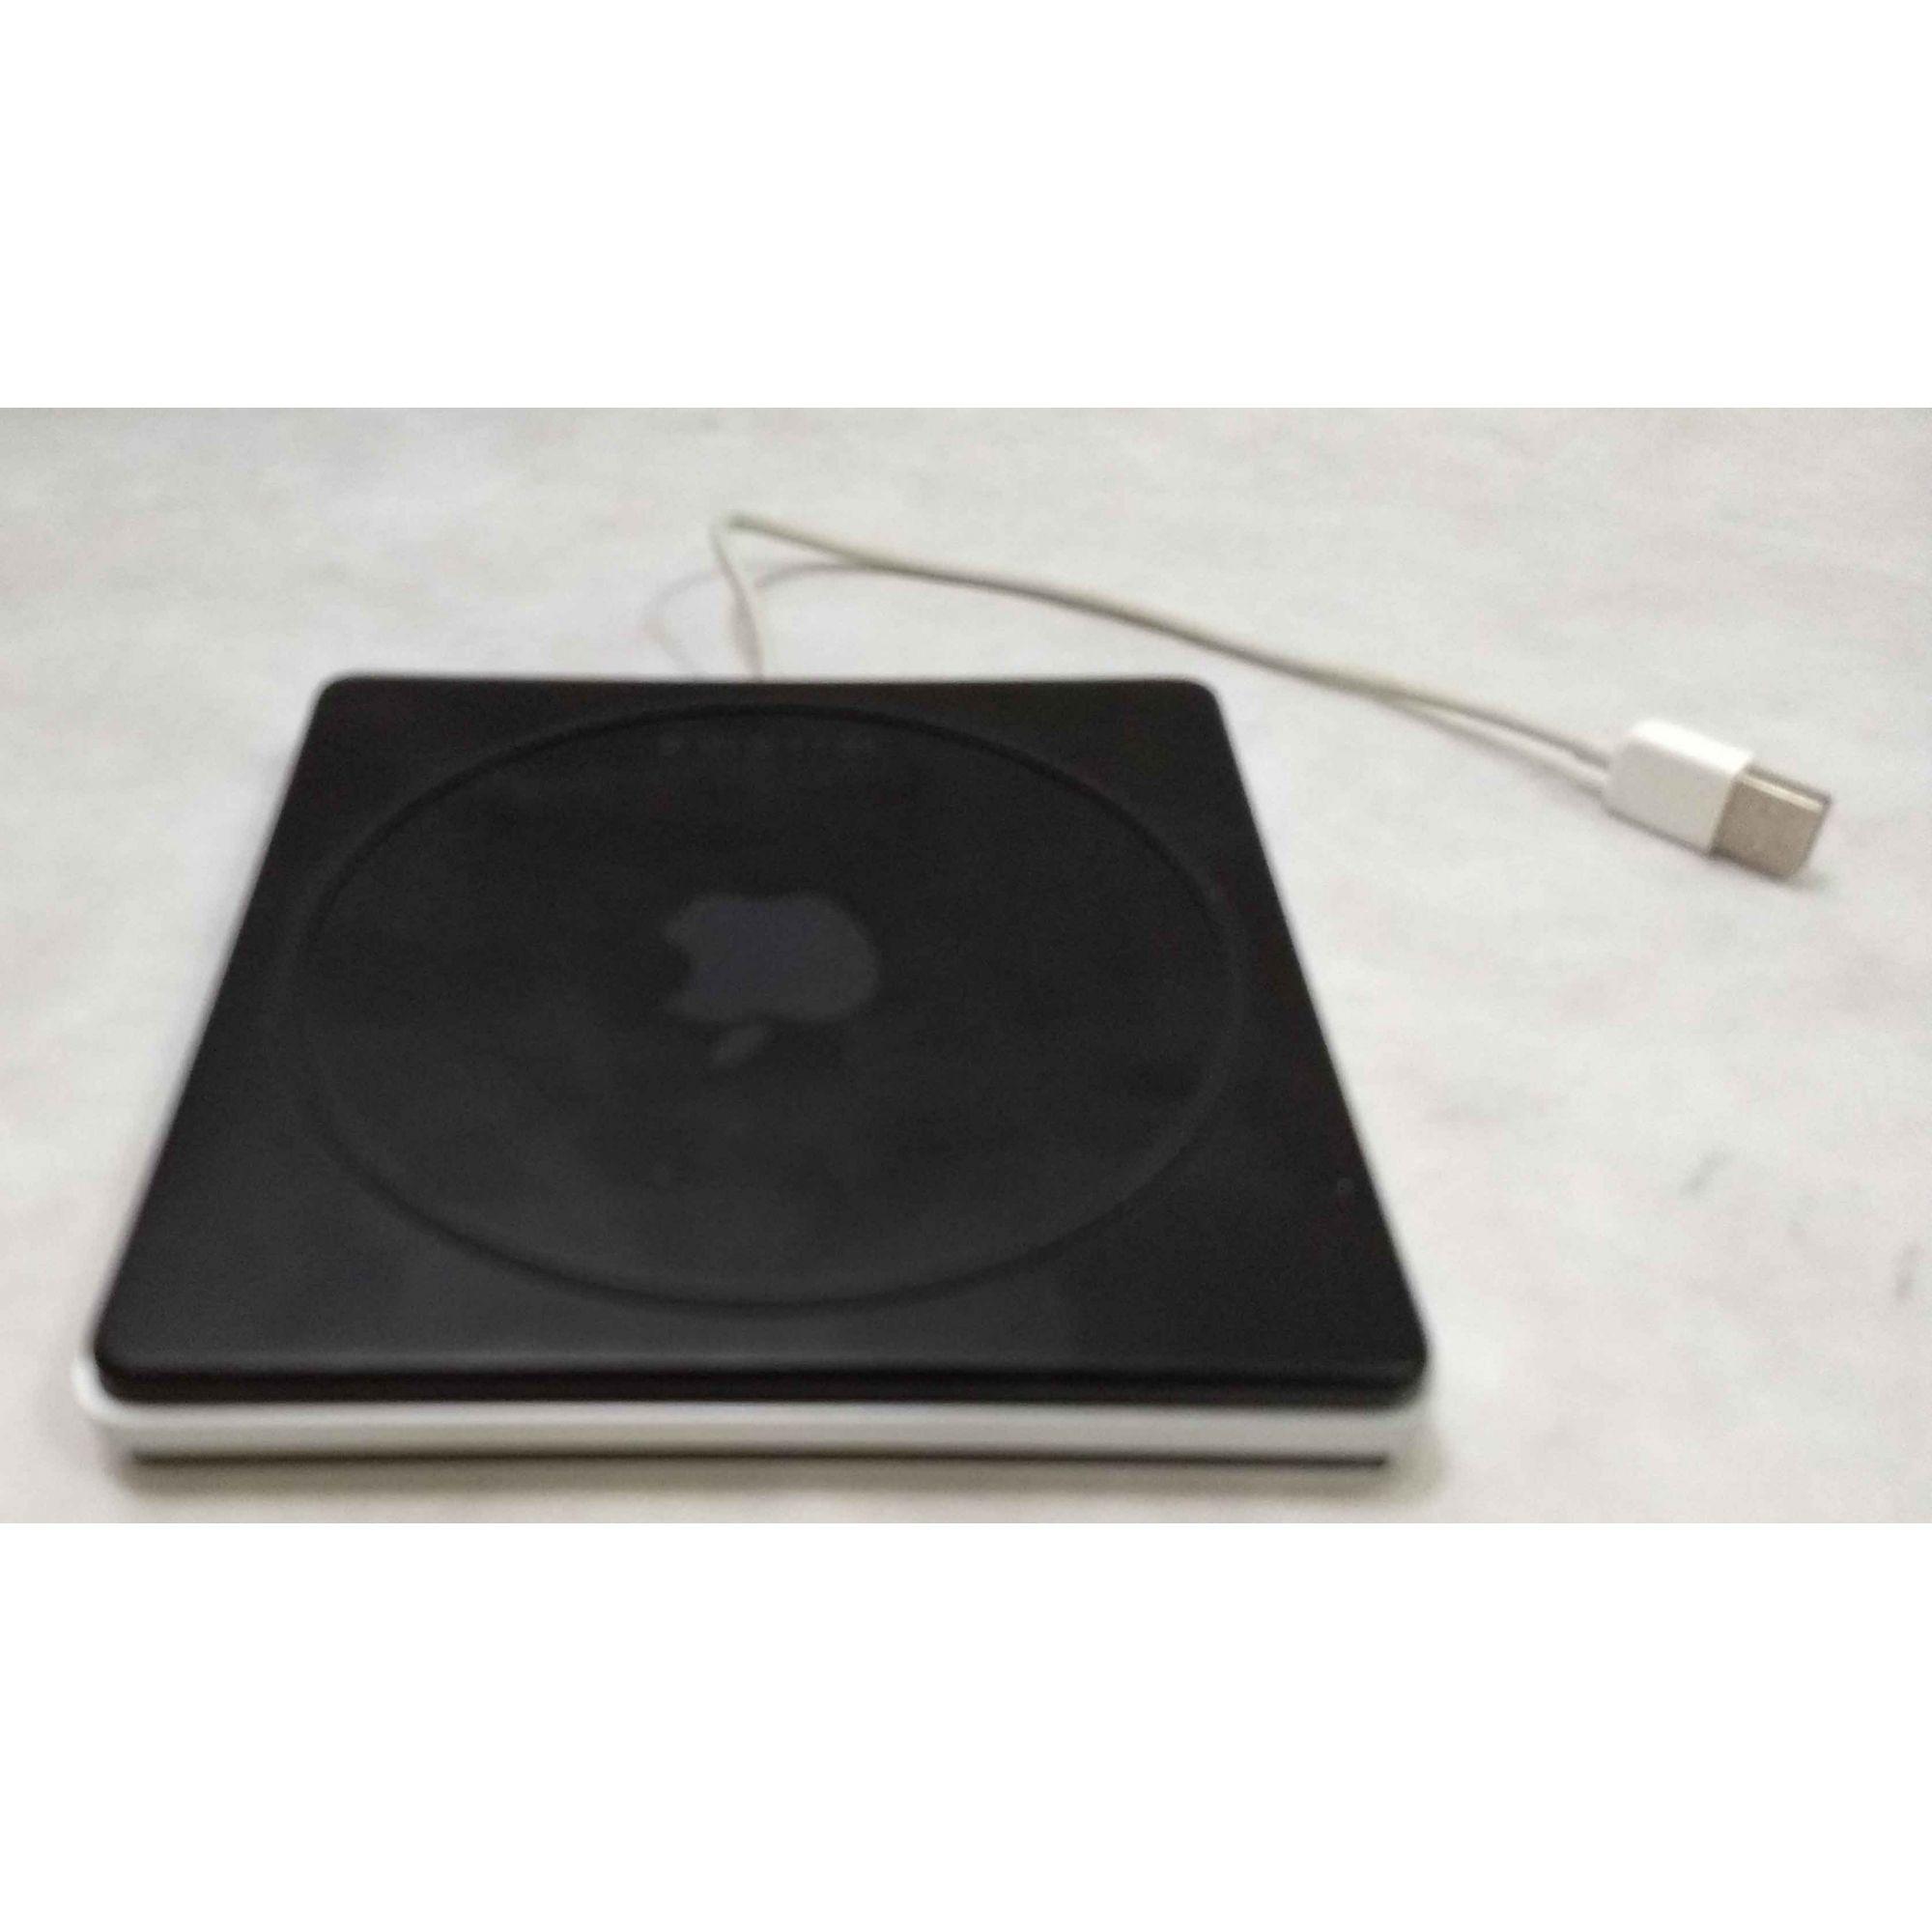 Apple USB SuperDrive CD/DVD/Combo